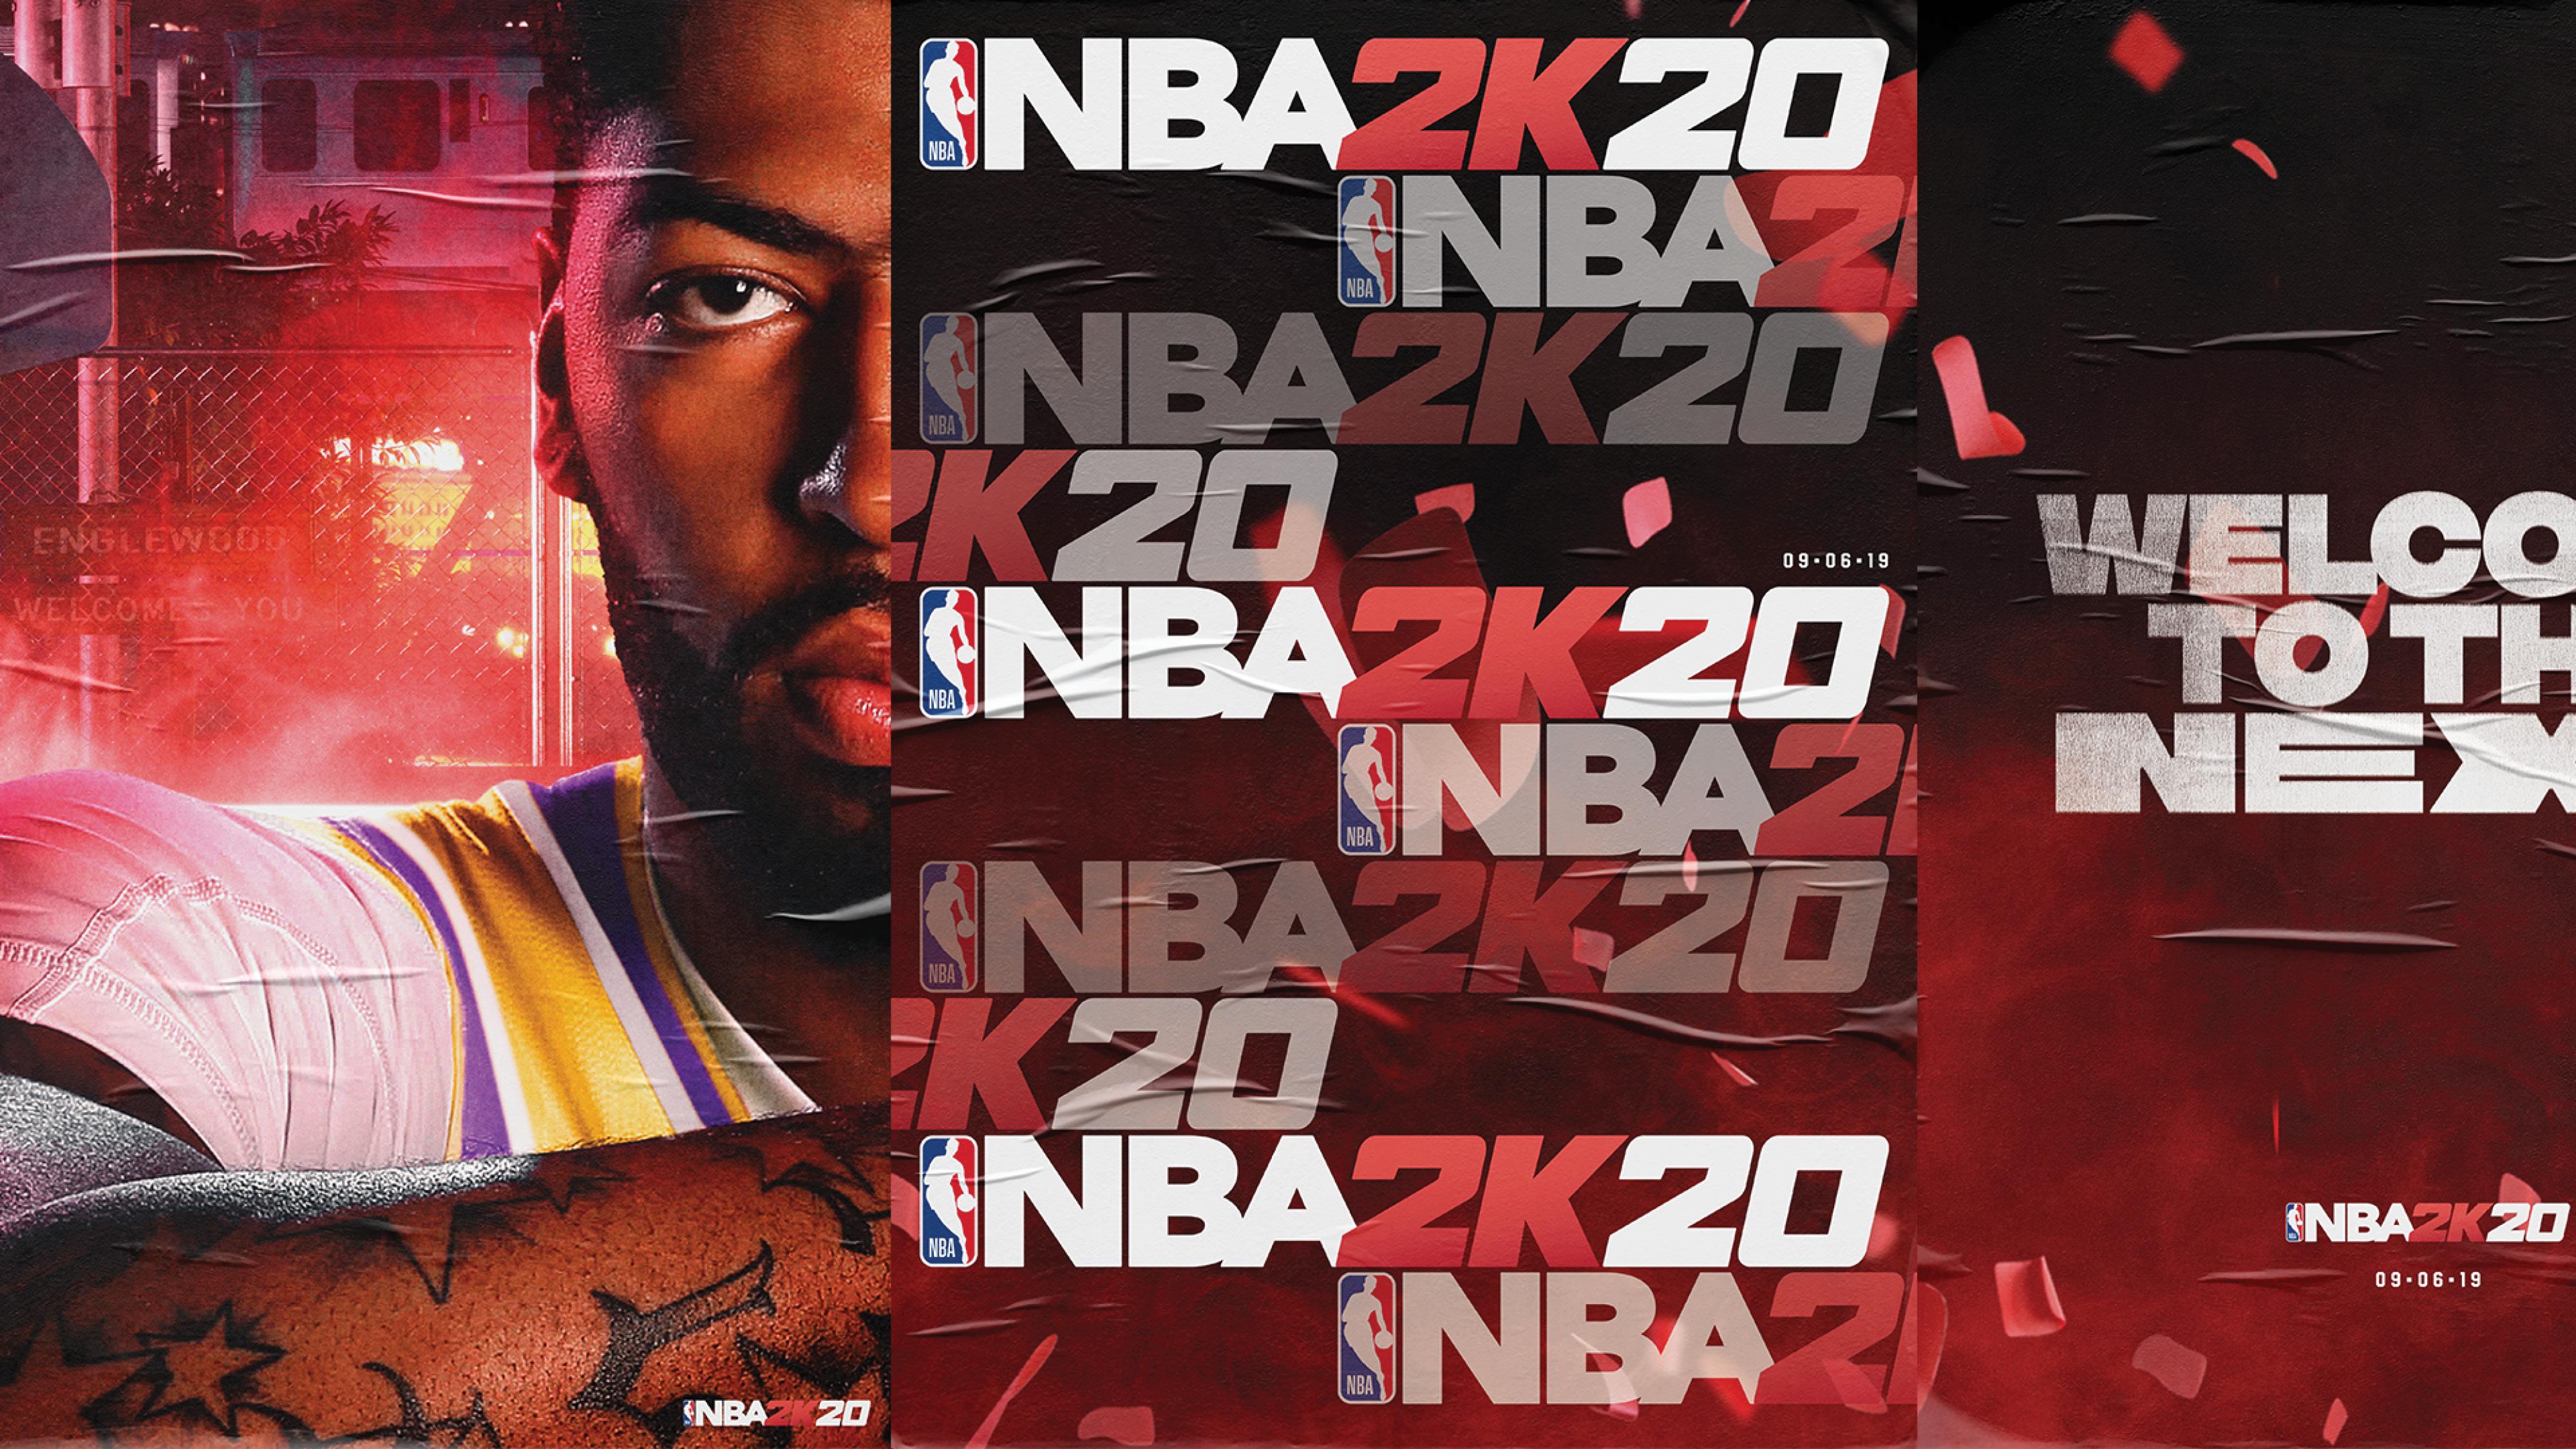 NBA2k20_PortfolioImages_1920x1080_017